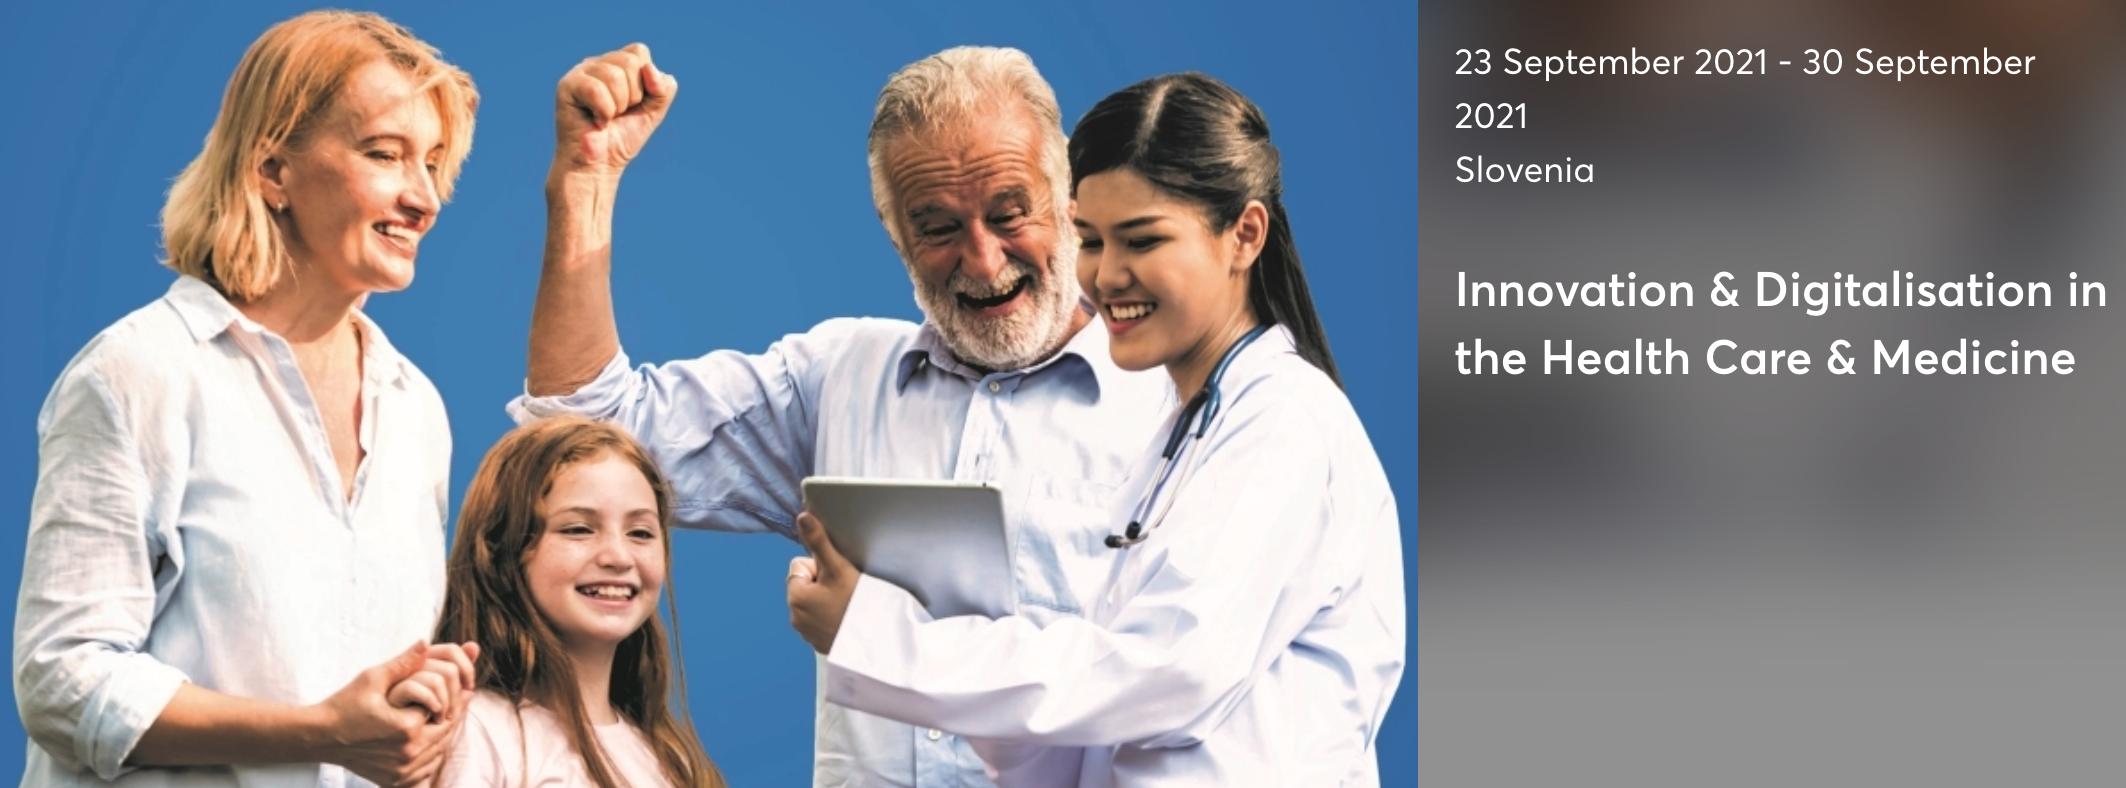 Innovation & Digitalisation in the Health Care & Medicine